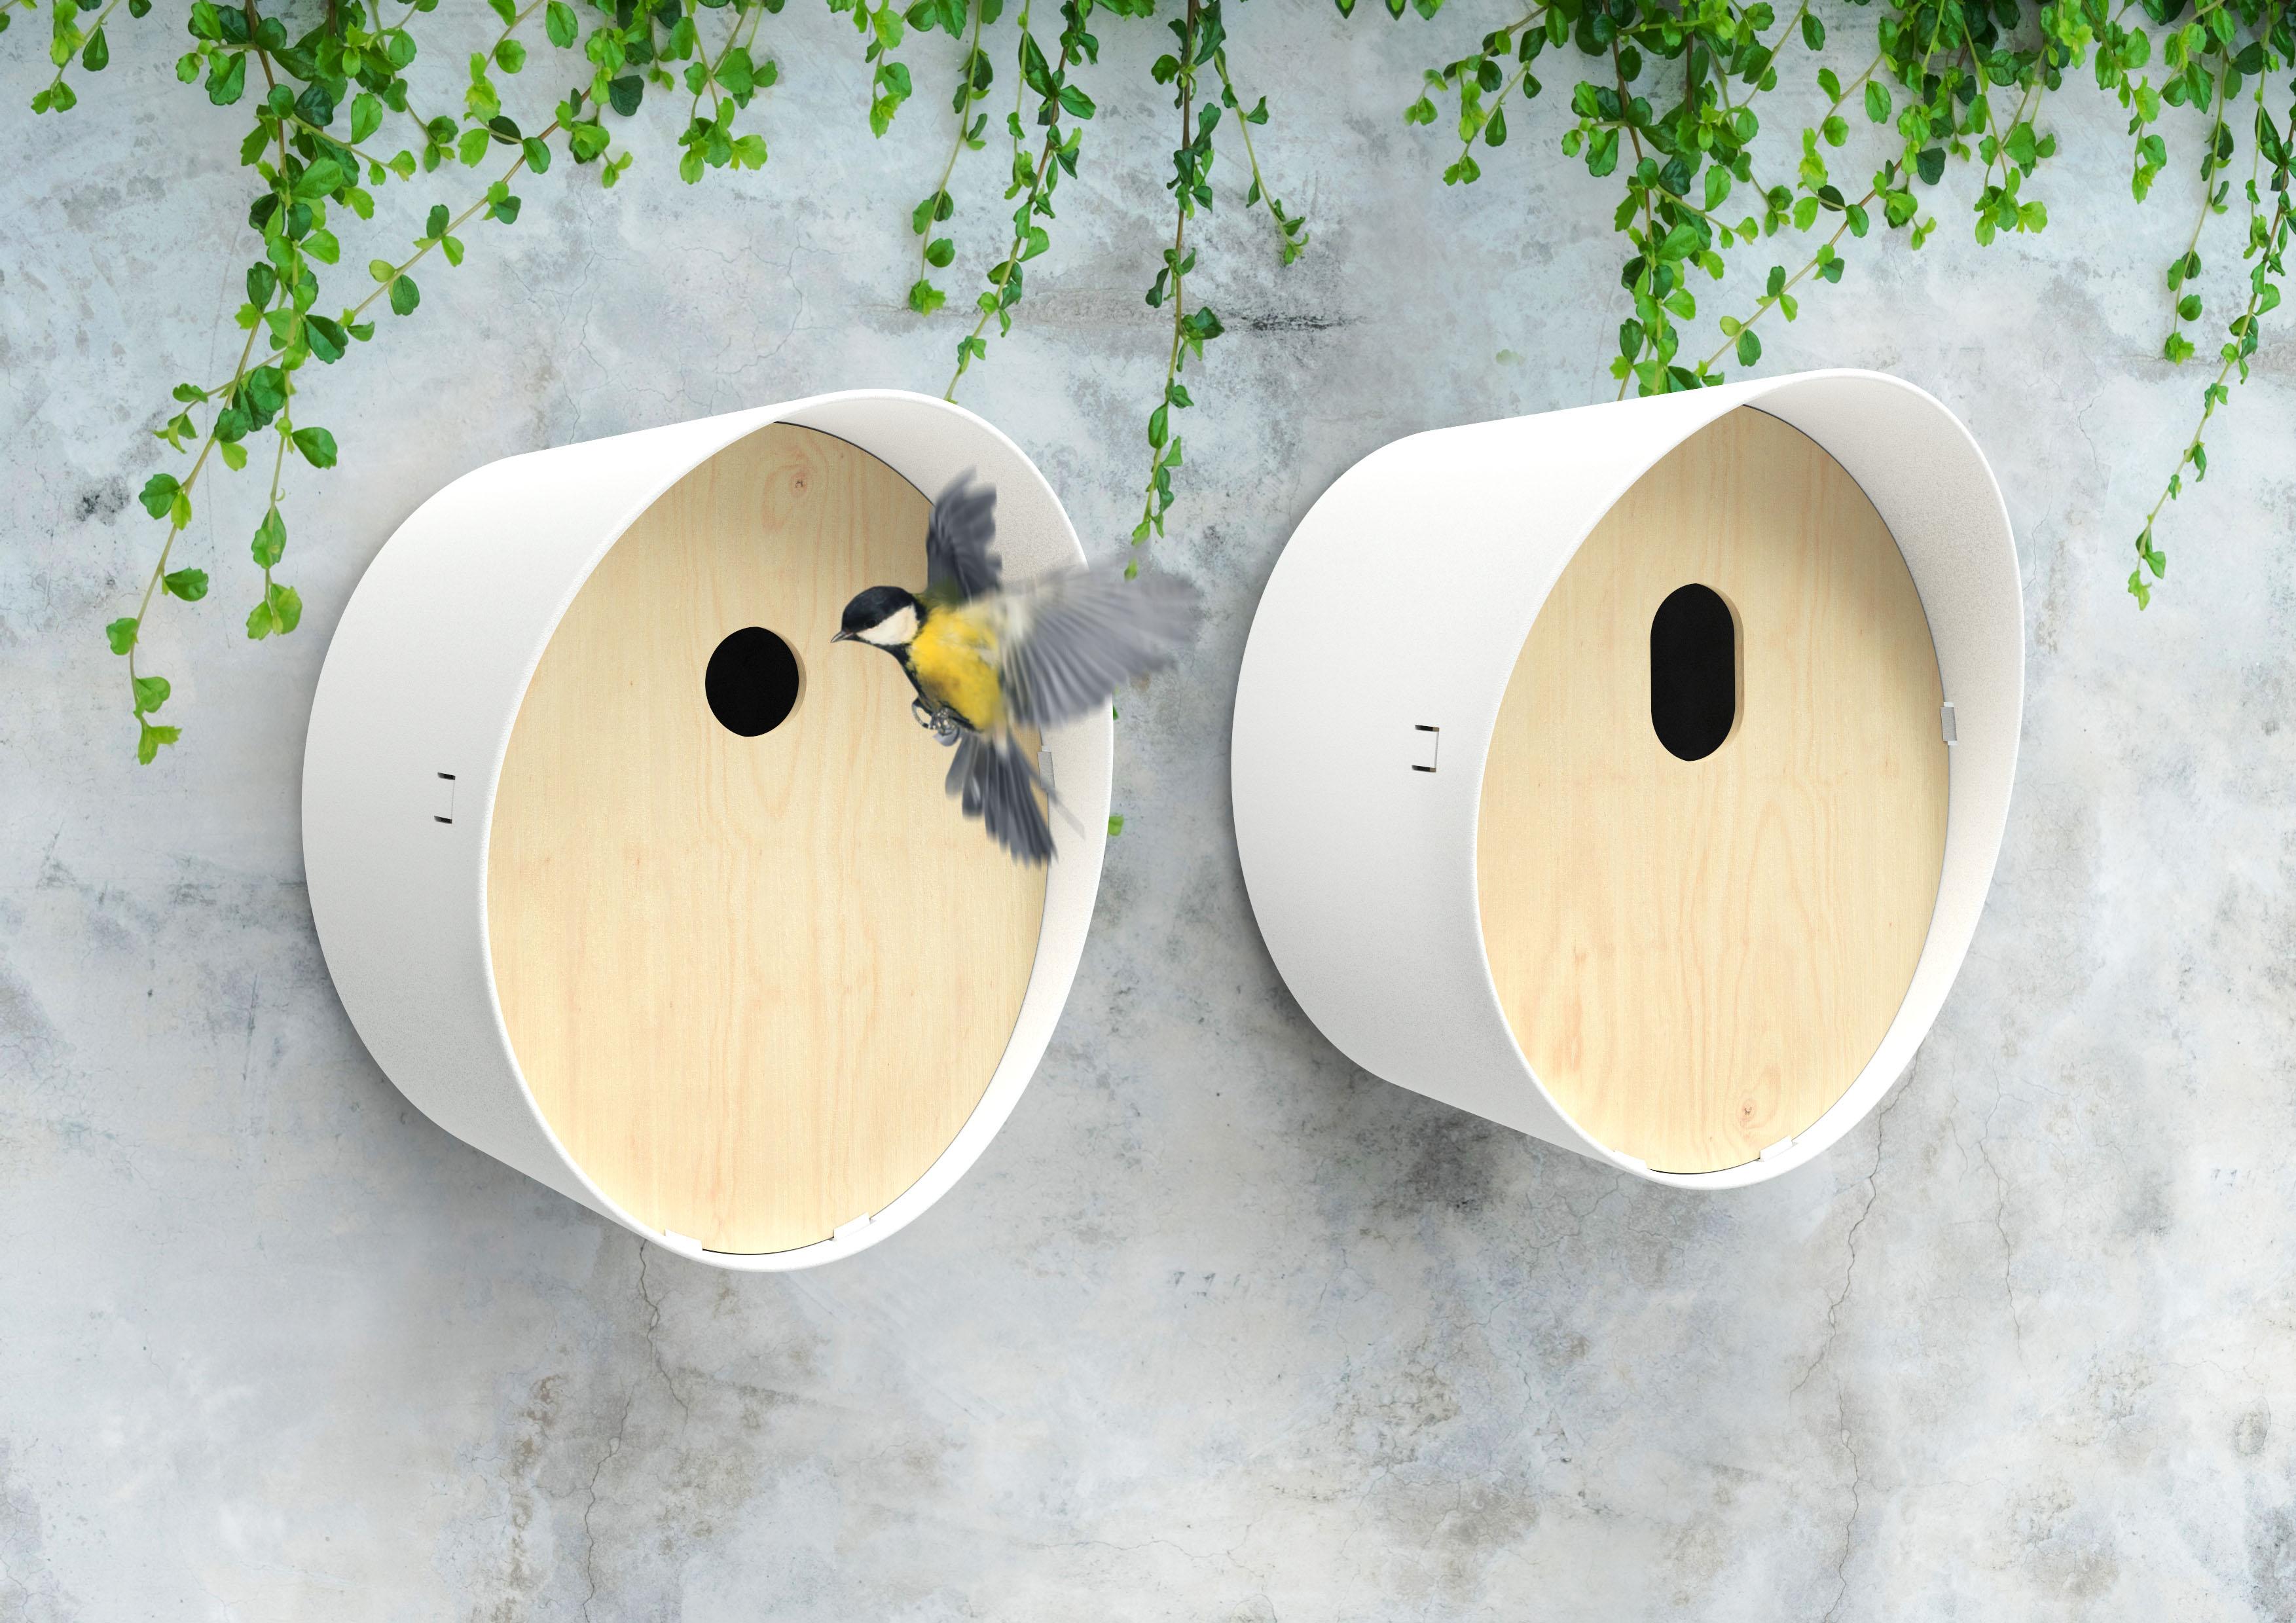 Capi Vogelhuisje Ovaal Wit